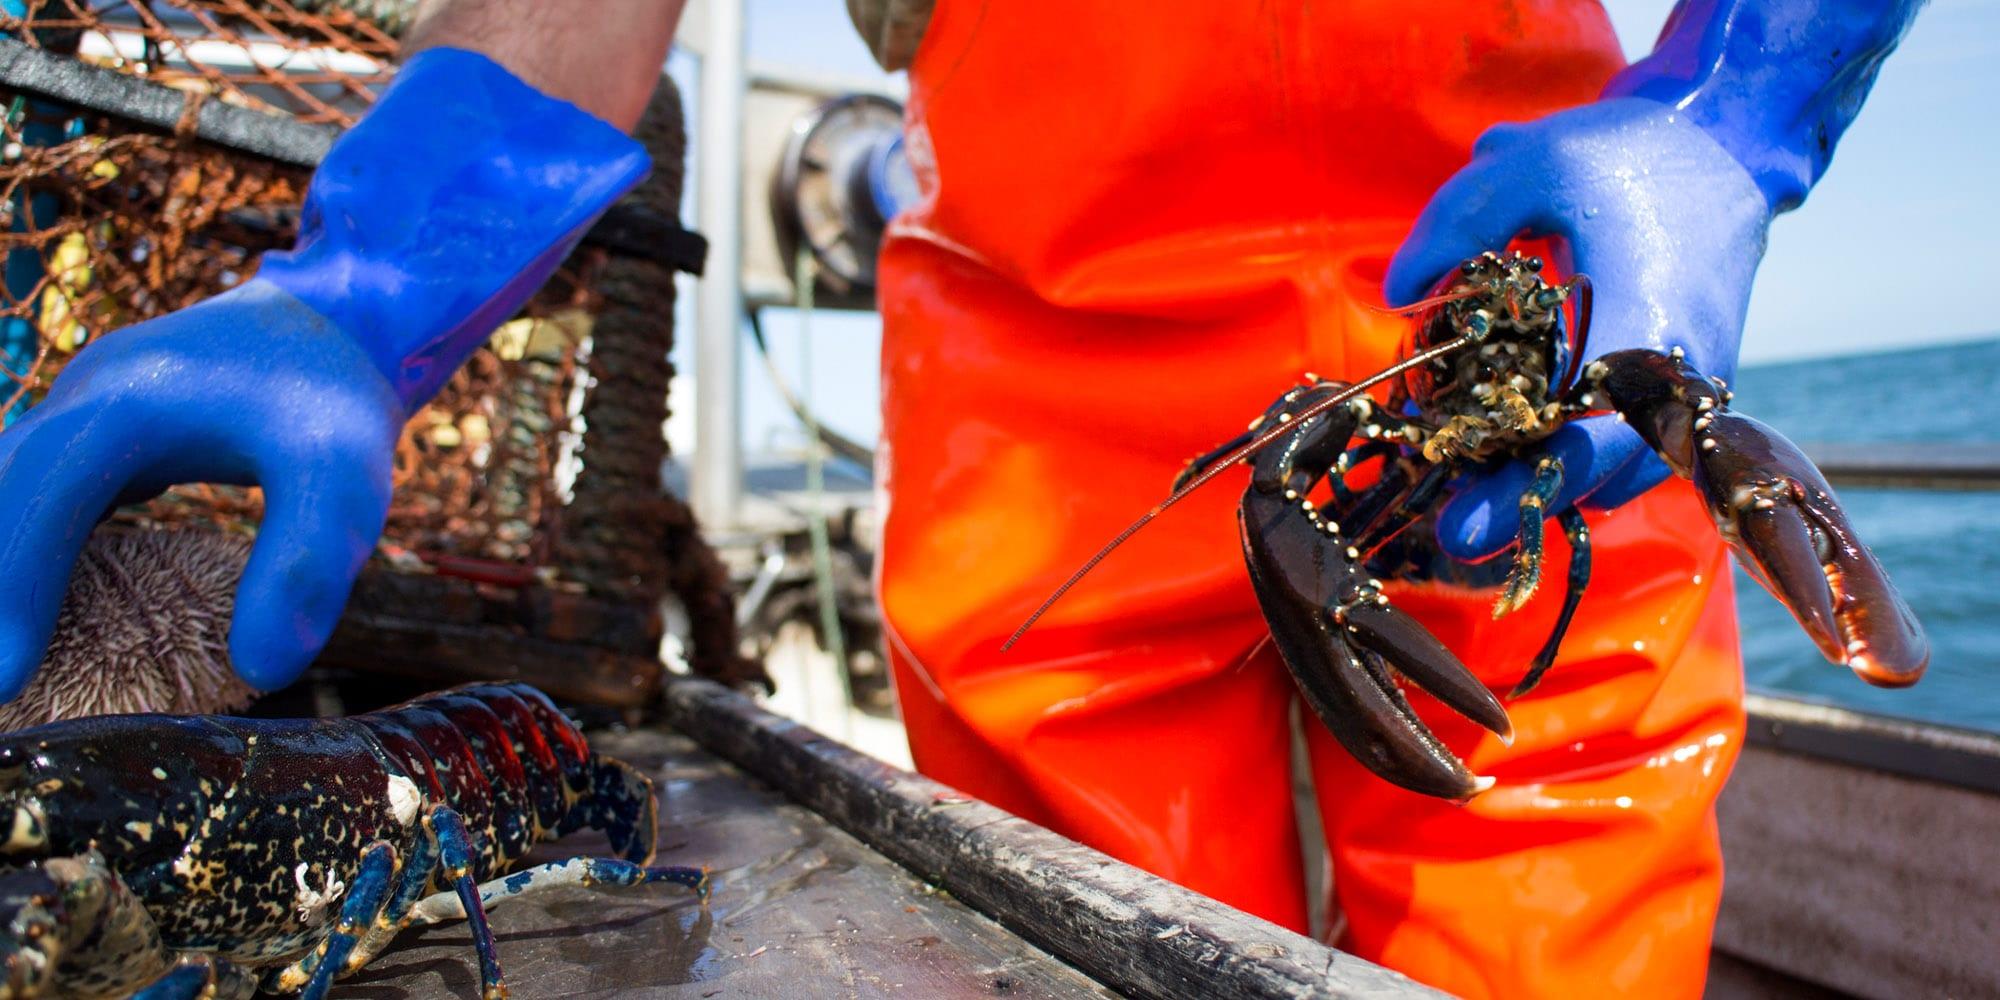 Precious cargo: How IoT sensors and AI could help keep perishable goods safe